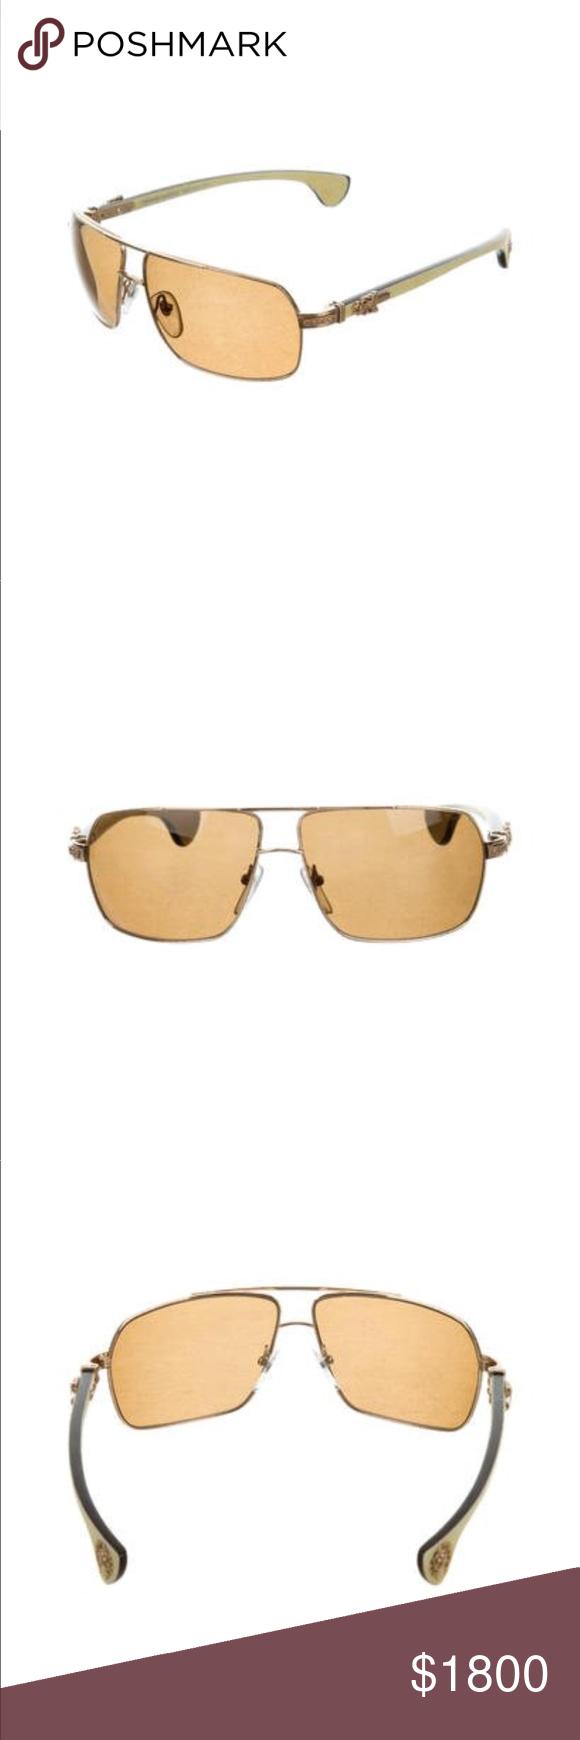 f40324a9a2a  Chrome Hearts Moorehead  Aviator Sunglasses Looks 🆕   No apparent  scratches Chrome